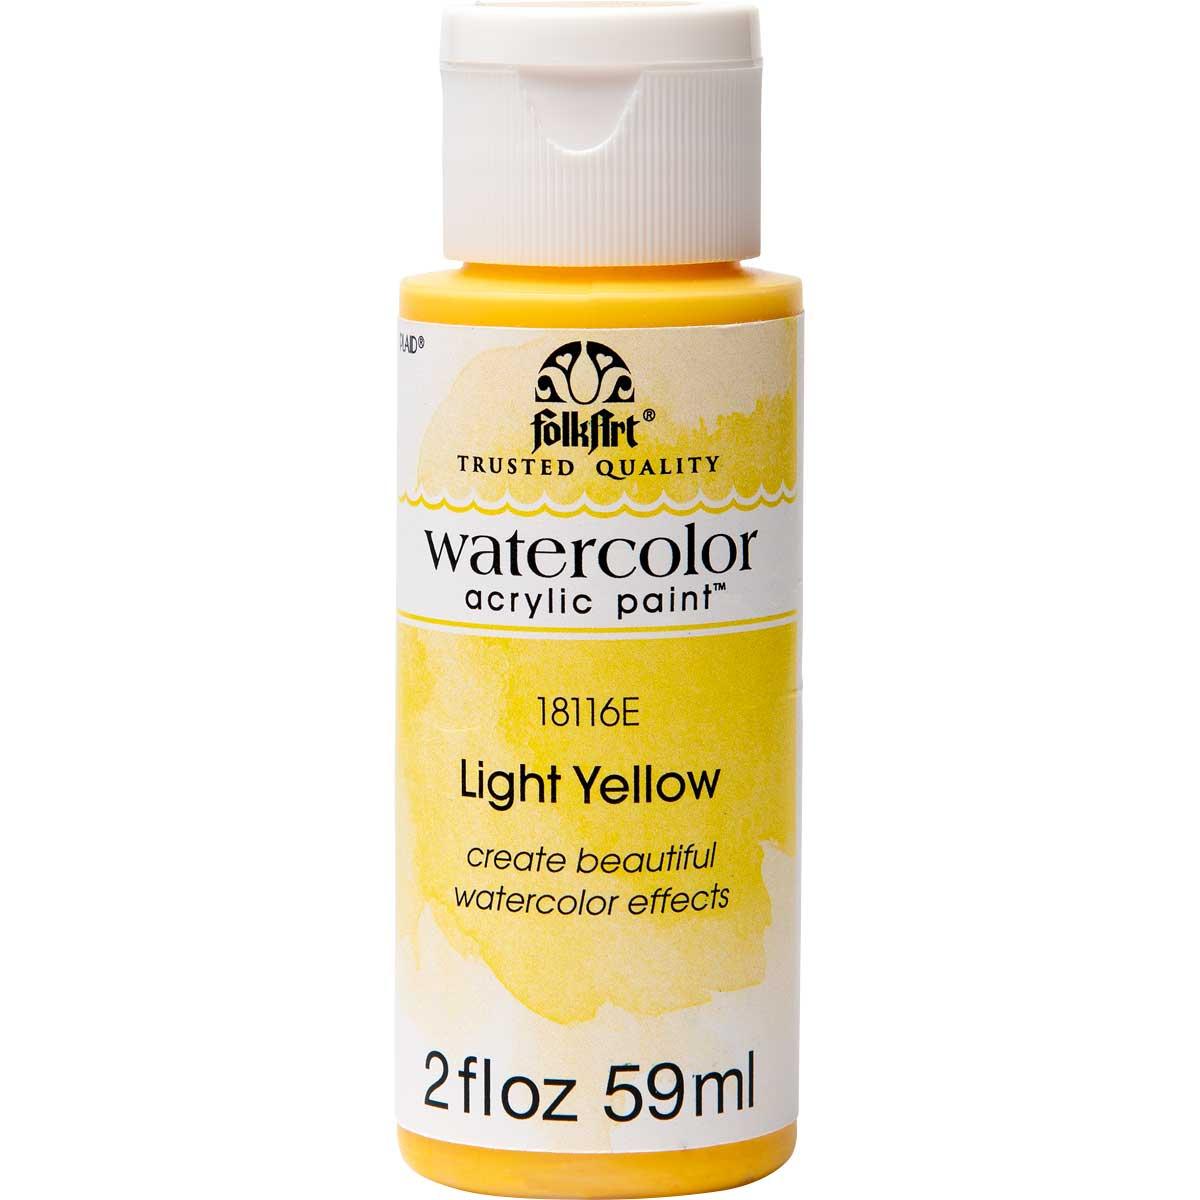 FolkArt ® Watercolor Acrylic Paint™ - Light Yellow, 2 oz. - 18116